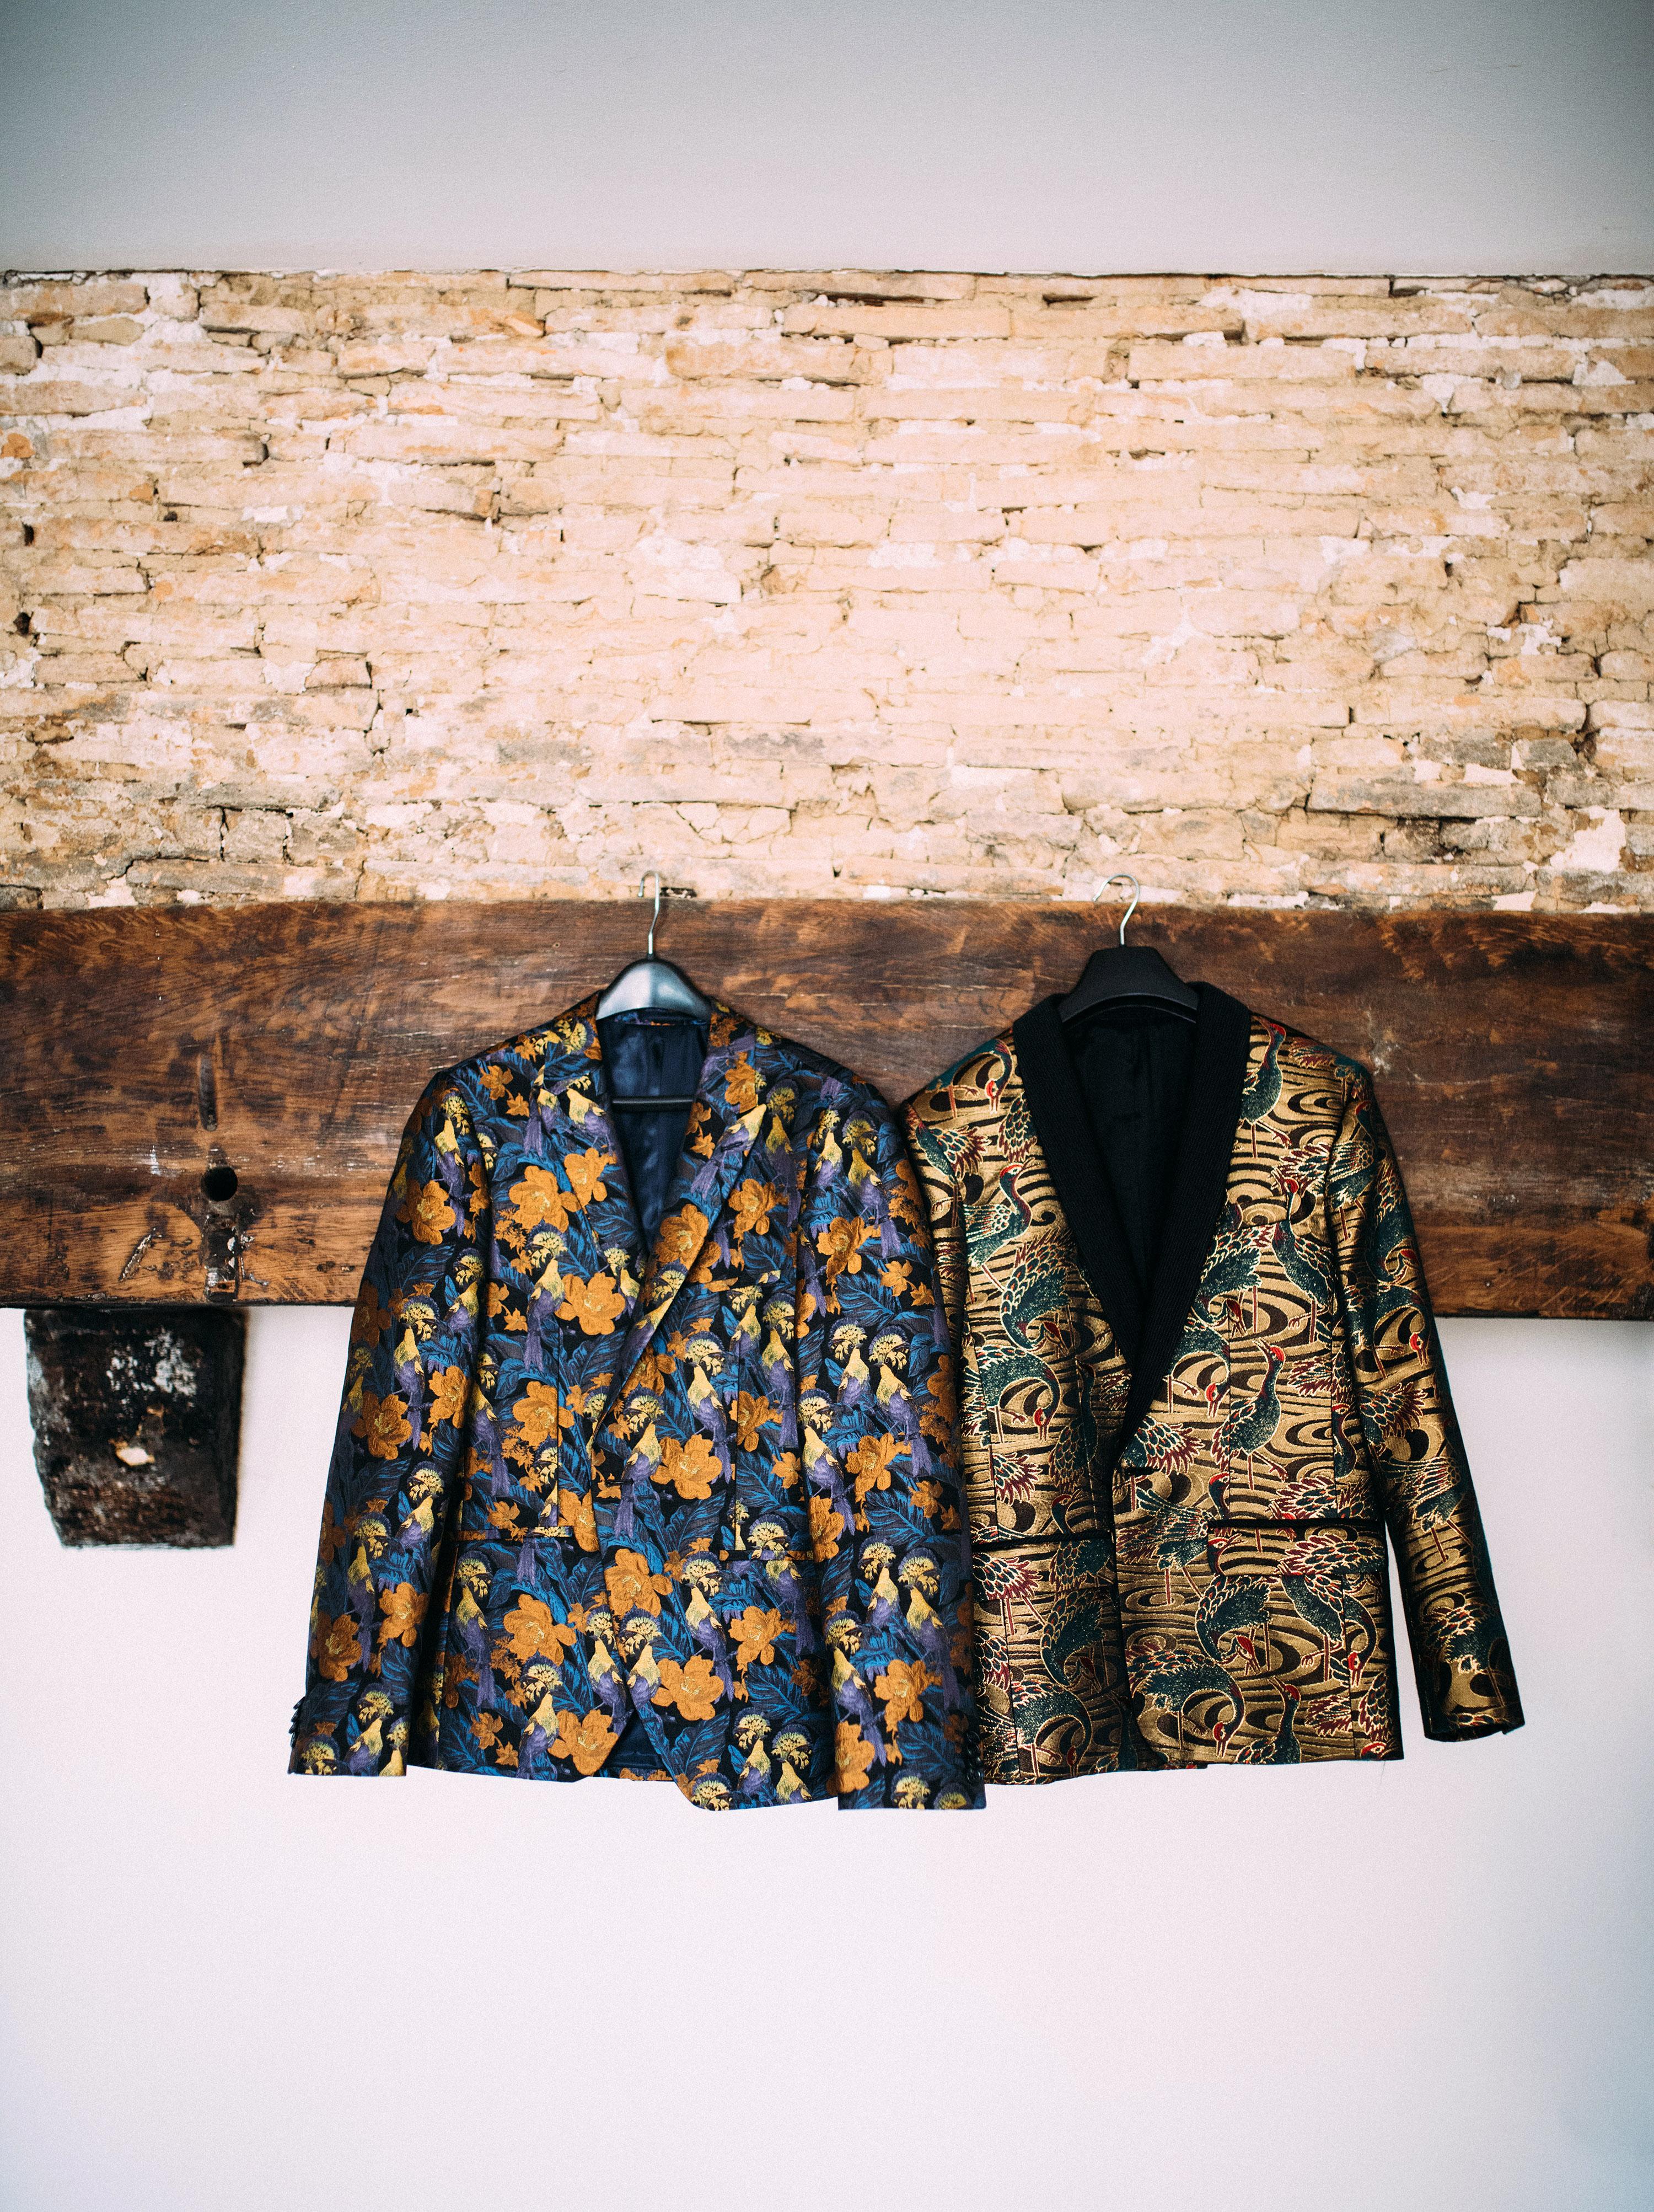 thomas jared wedding grooms patterned jackets